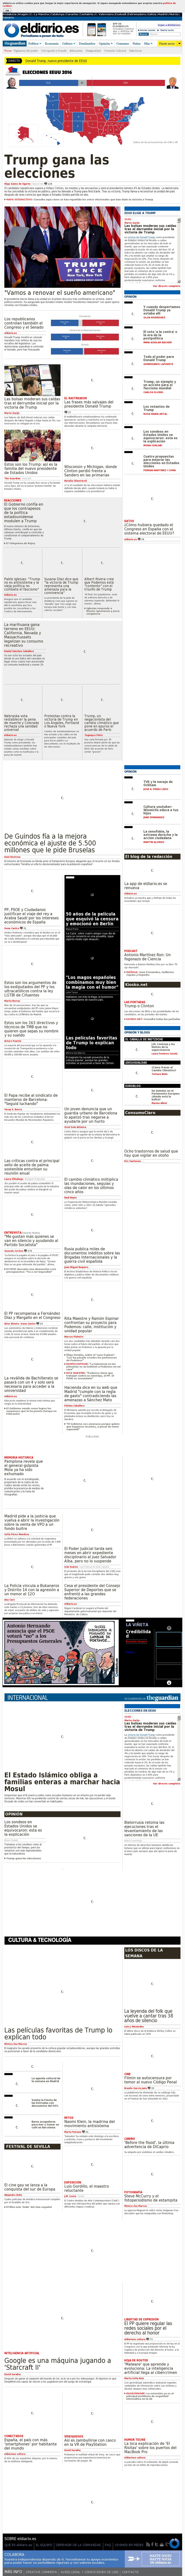 El Diario at Wednesday Nov. 9, 2016, 12:04 p.m. UTC